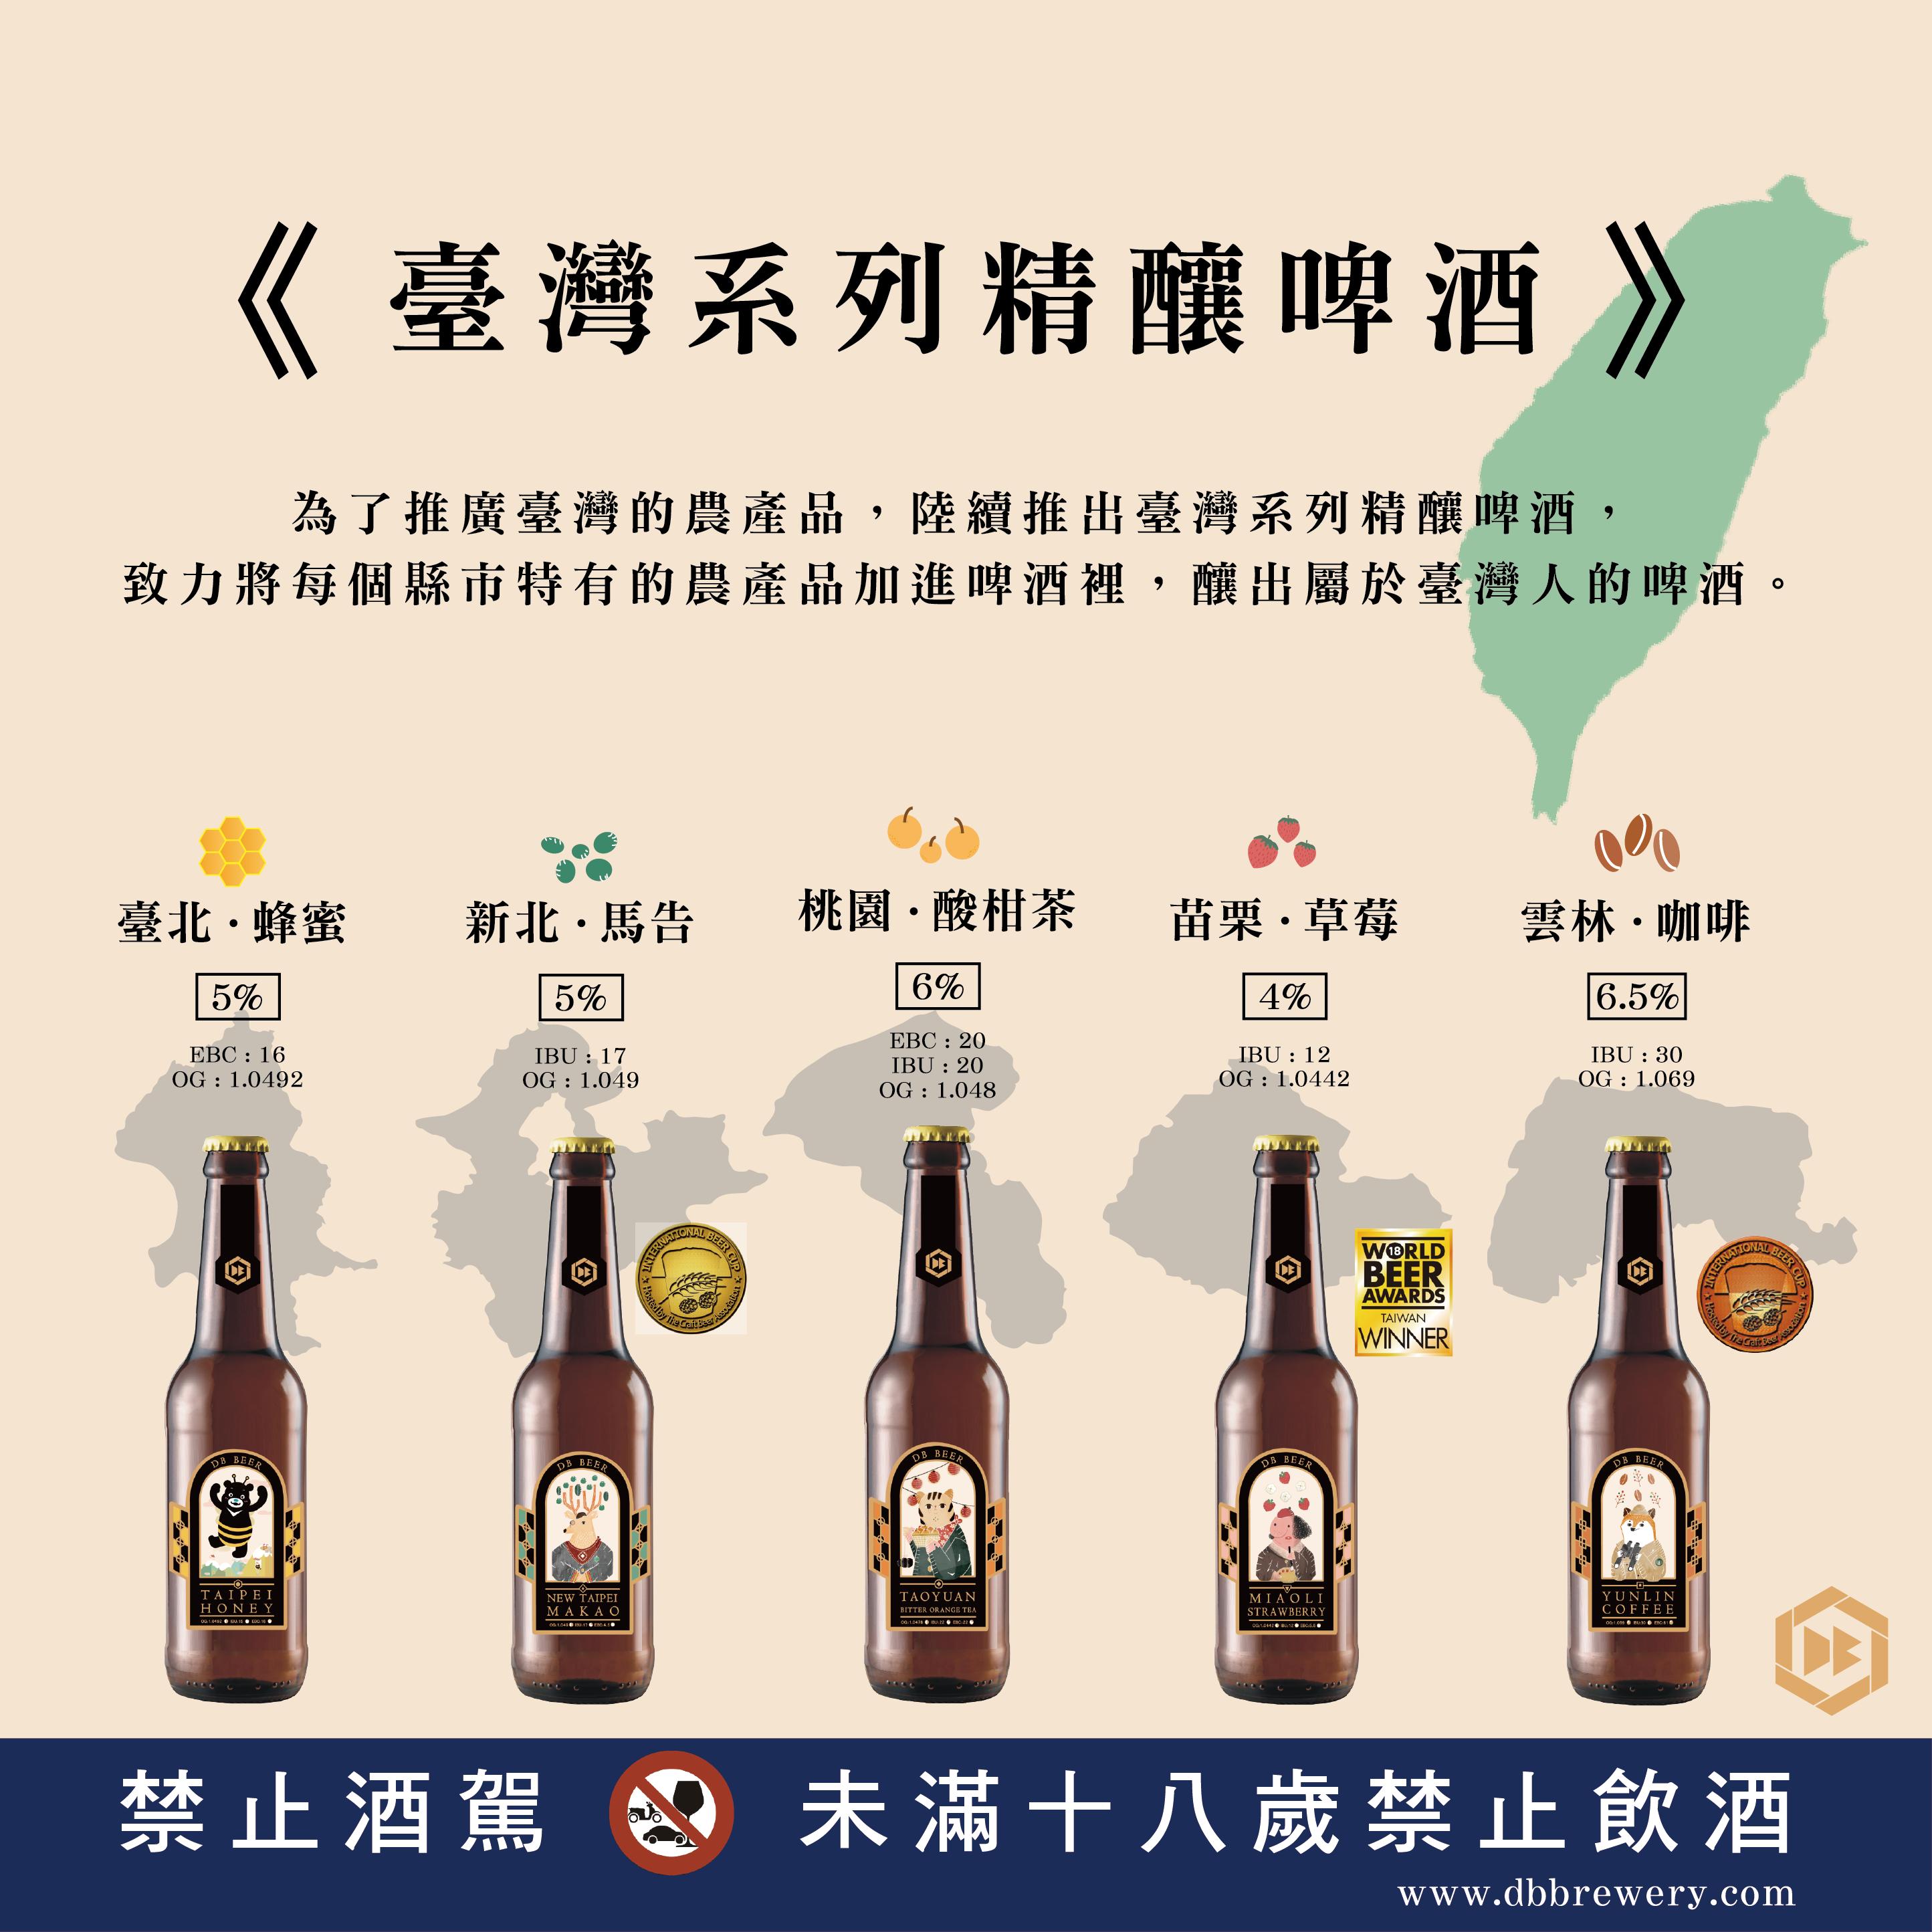 DB Beer 鄧爸麥酒